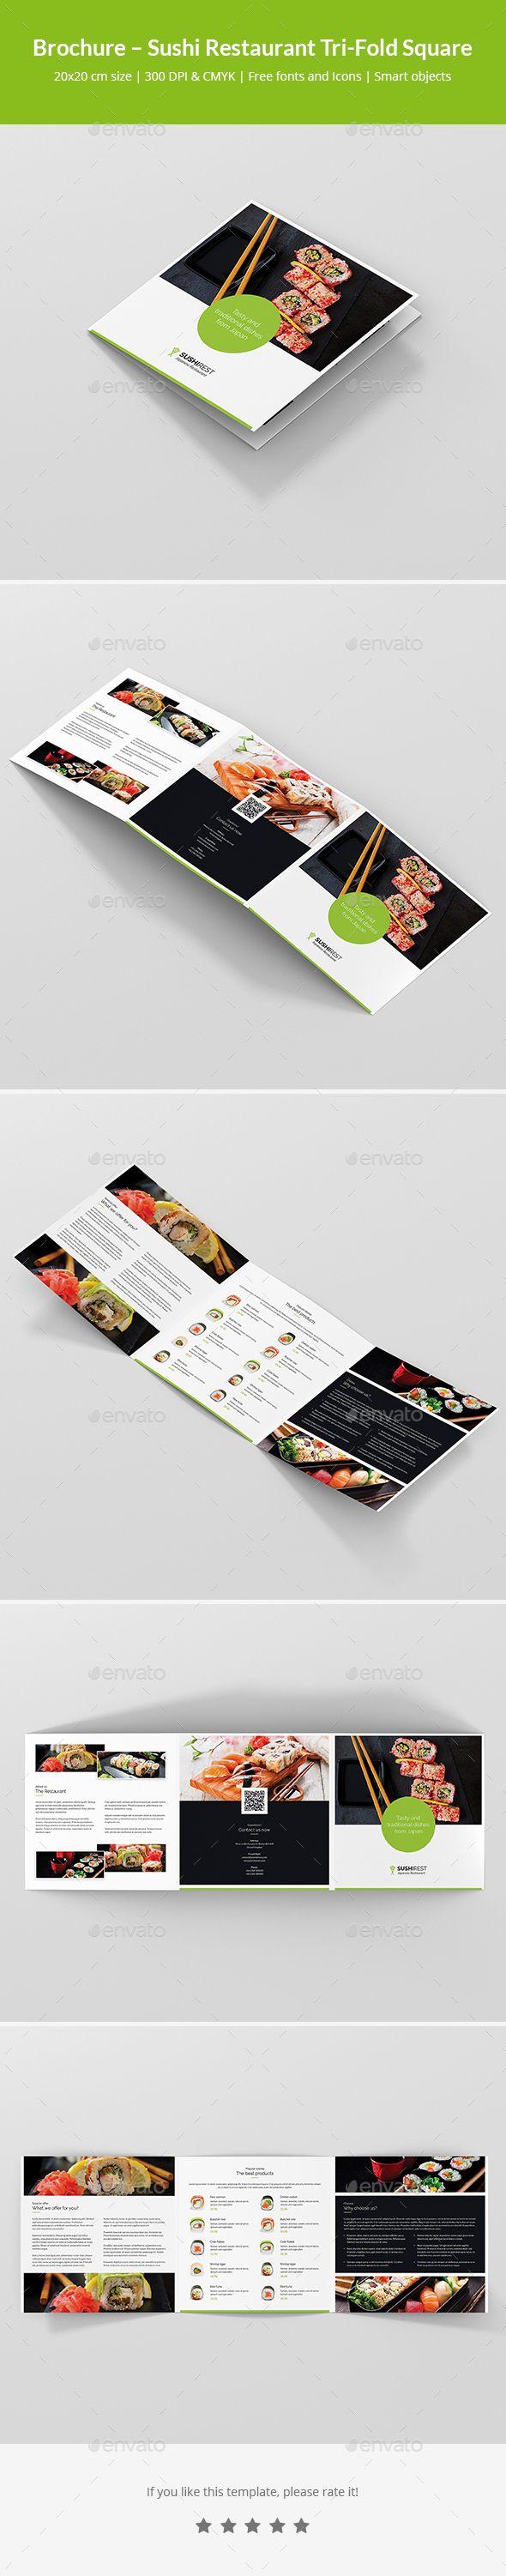 Sushi Restaurant Tri-Fold Square Brochure Template PSD #design ...